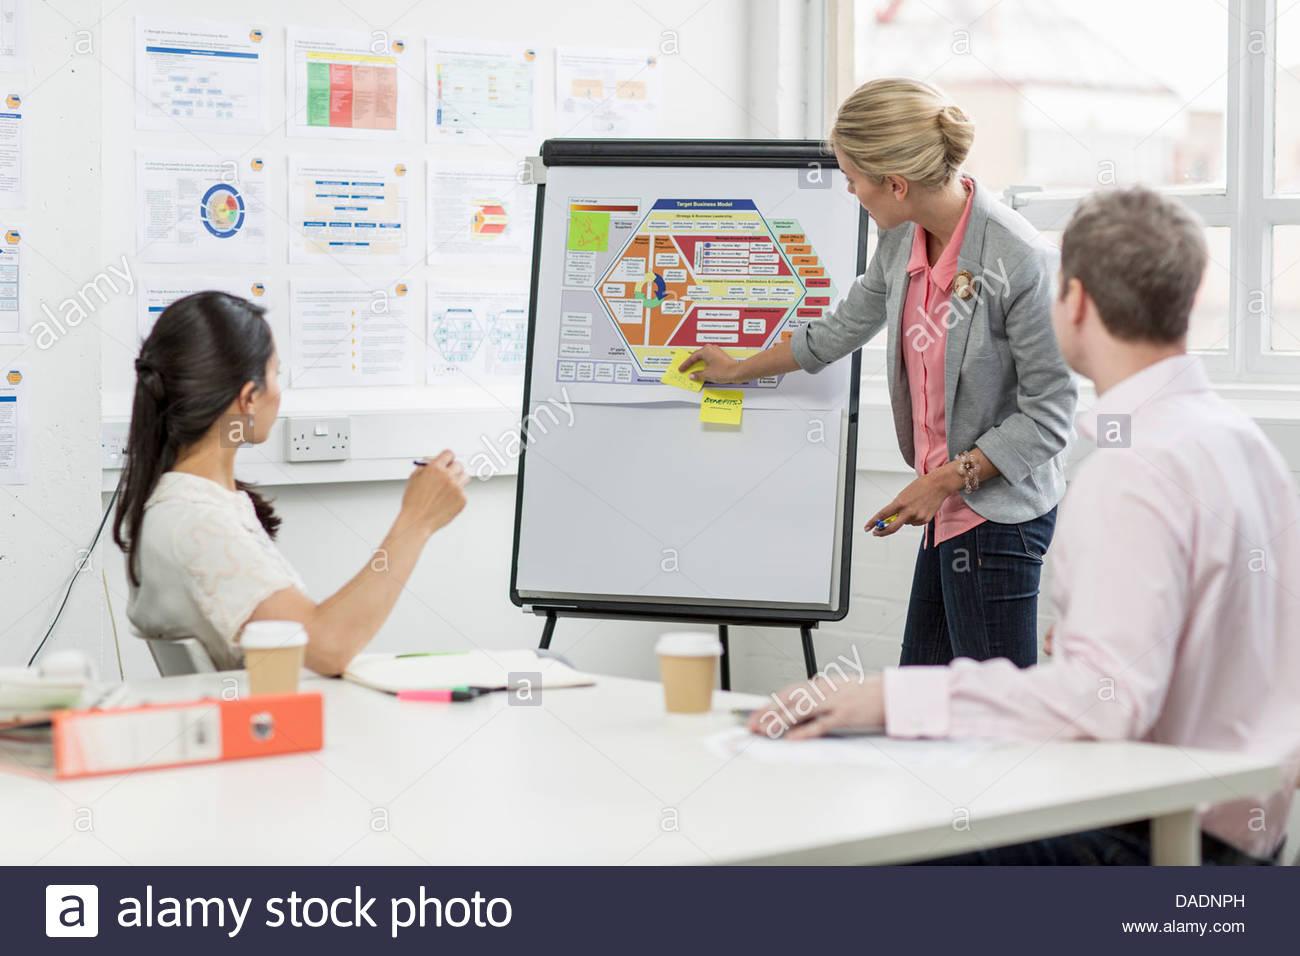 Business people looking at diagram in meeting room - Stock Image